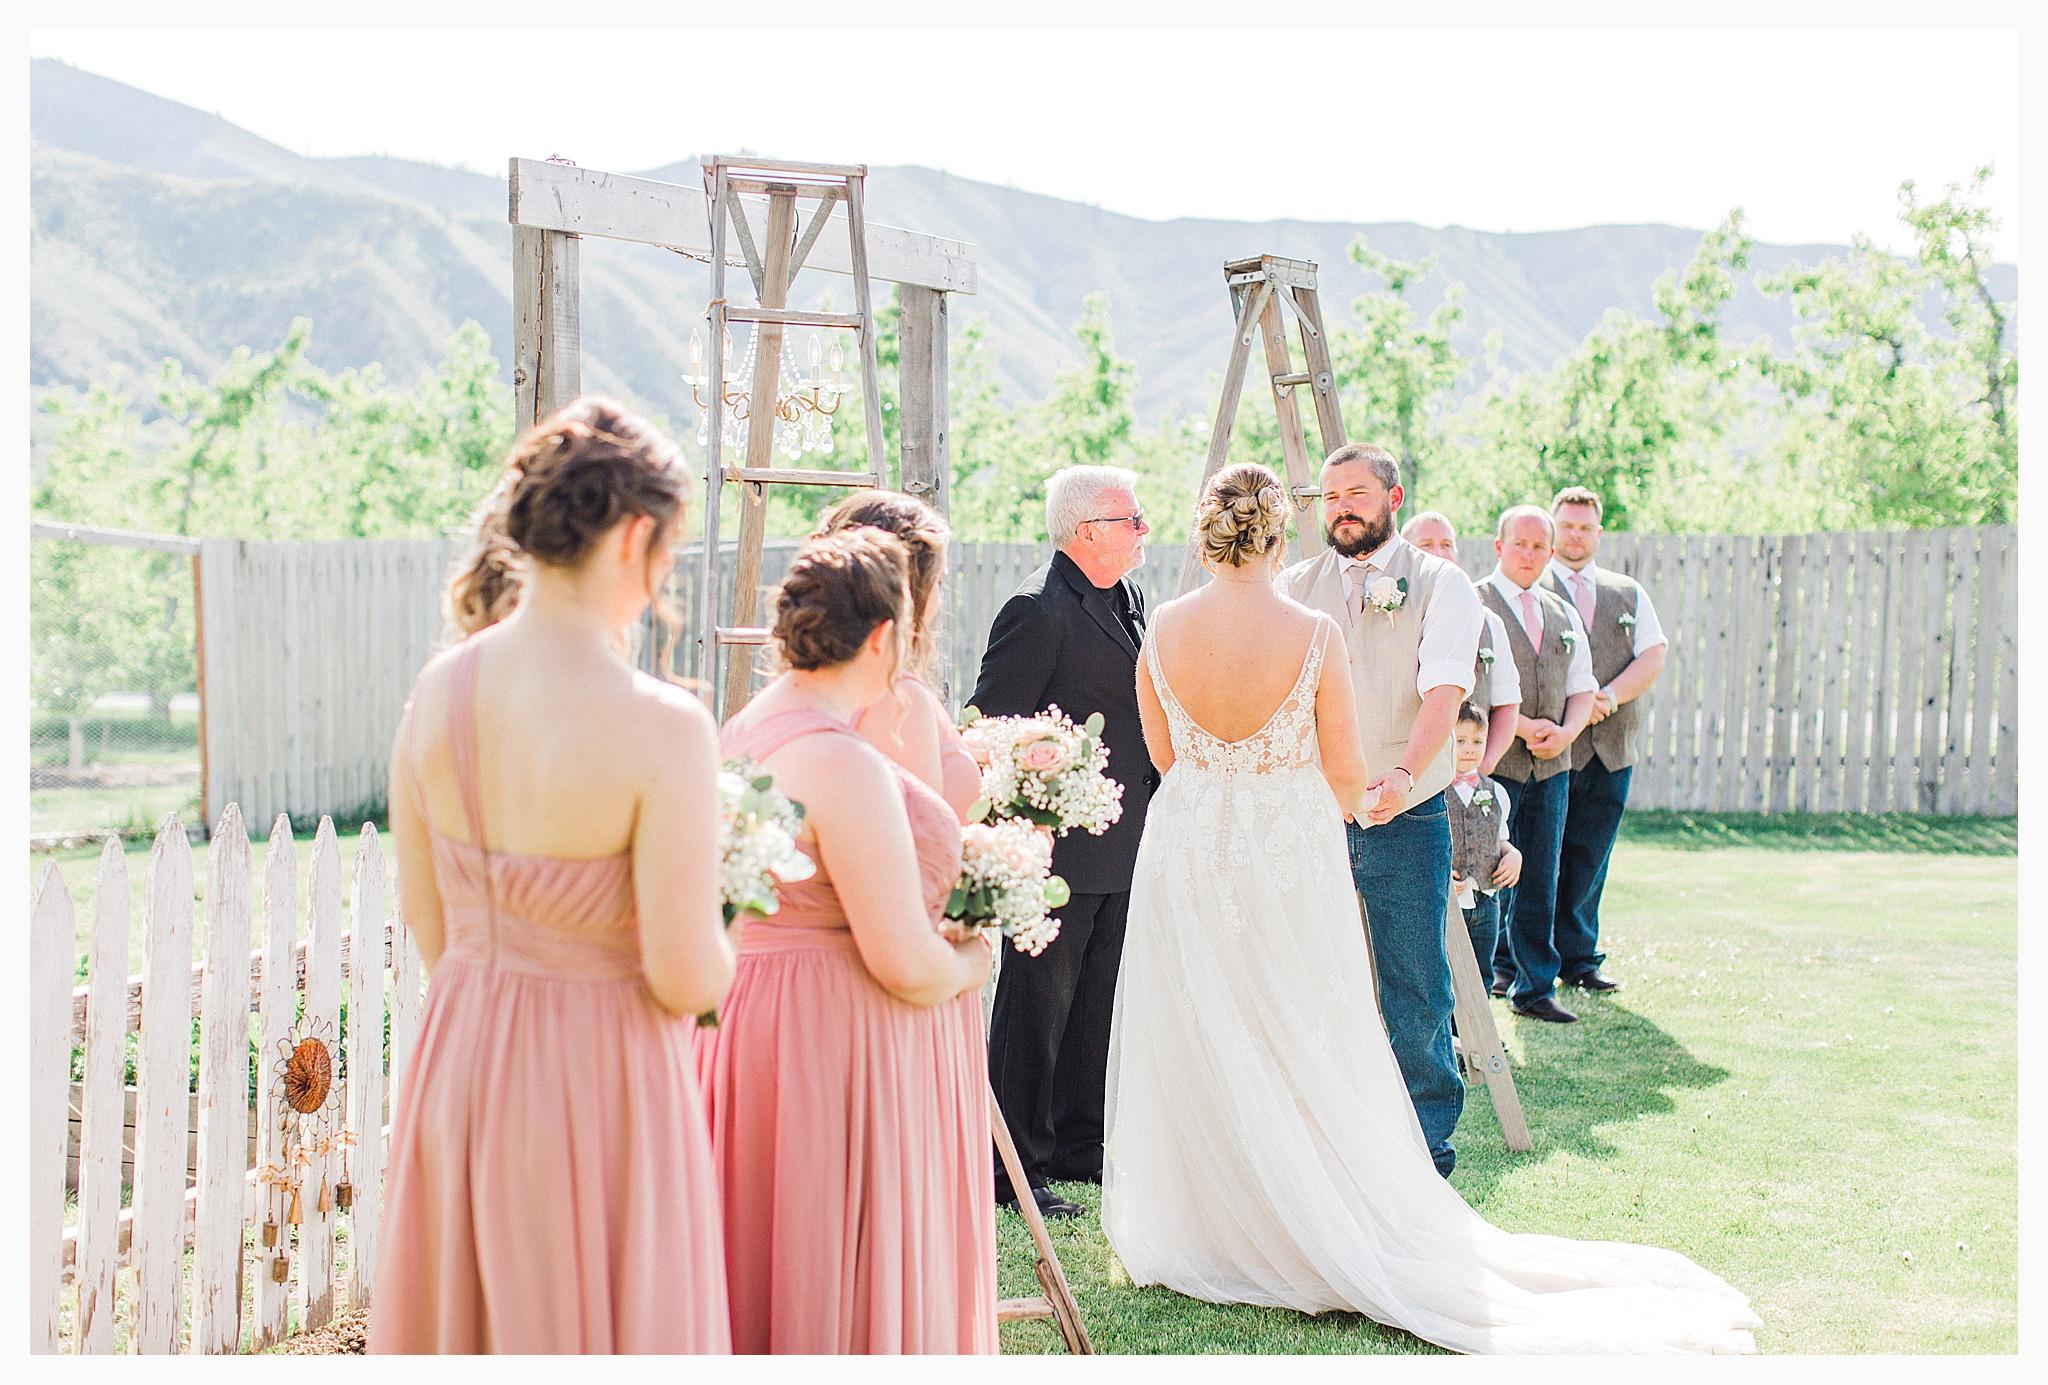 Rustic barn wedding in Wenatchee Washington at Sunshine Ranch on Easy Street, Emma Rose Company Seattle PNW Light and Airy Wedding Photographer_0071.jpg